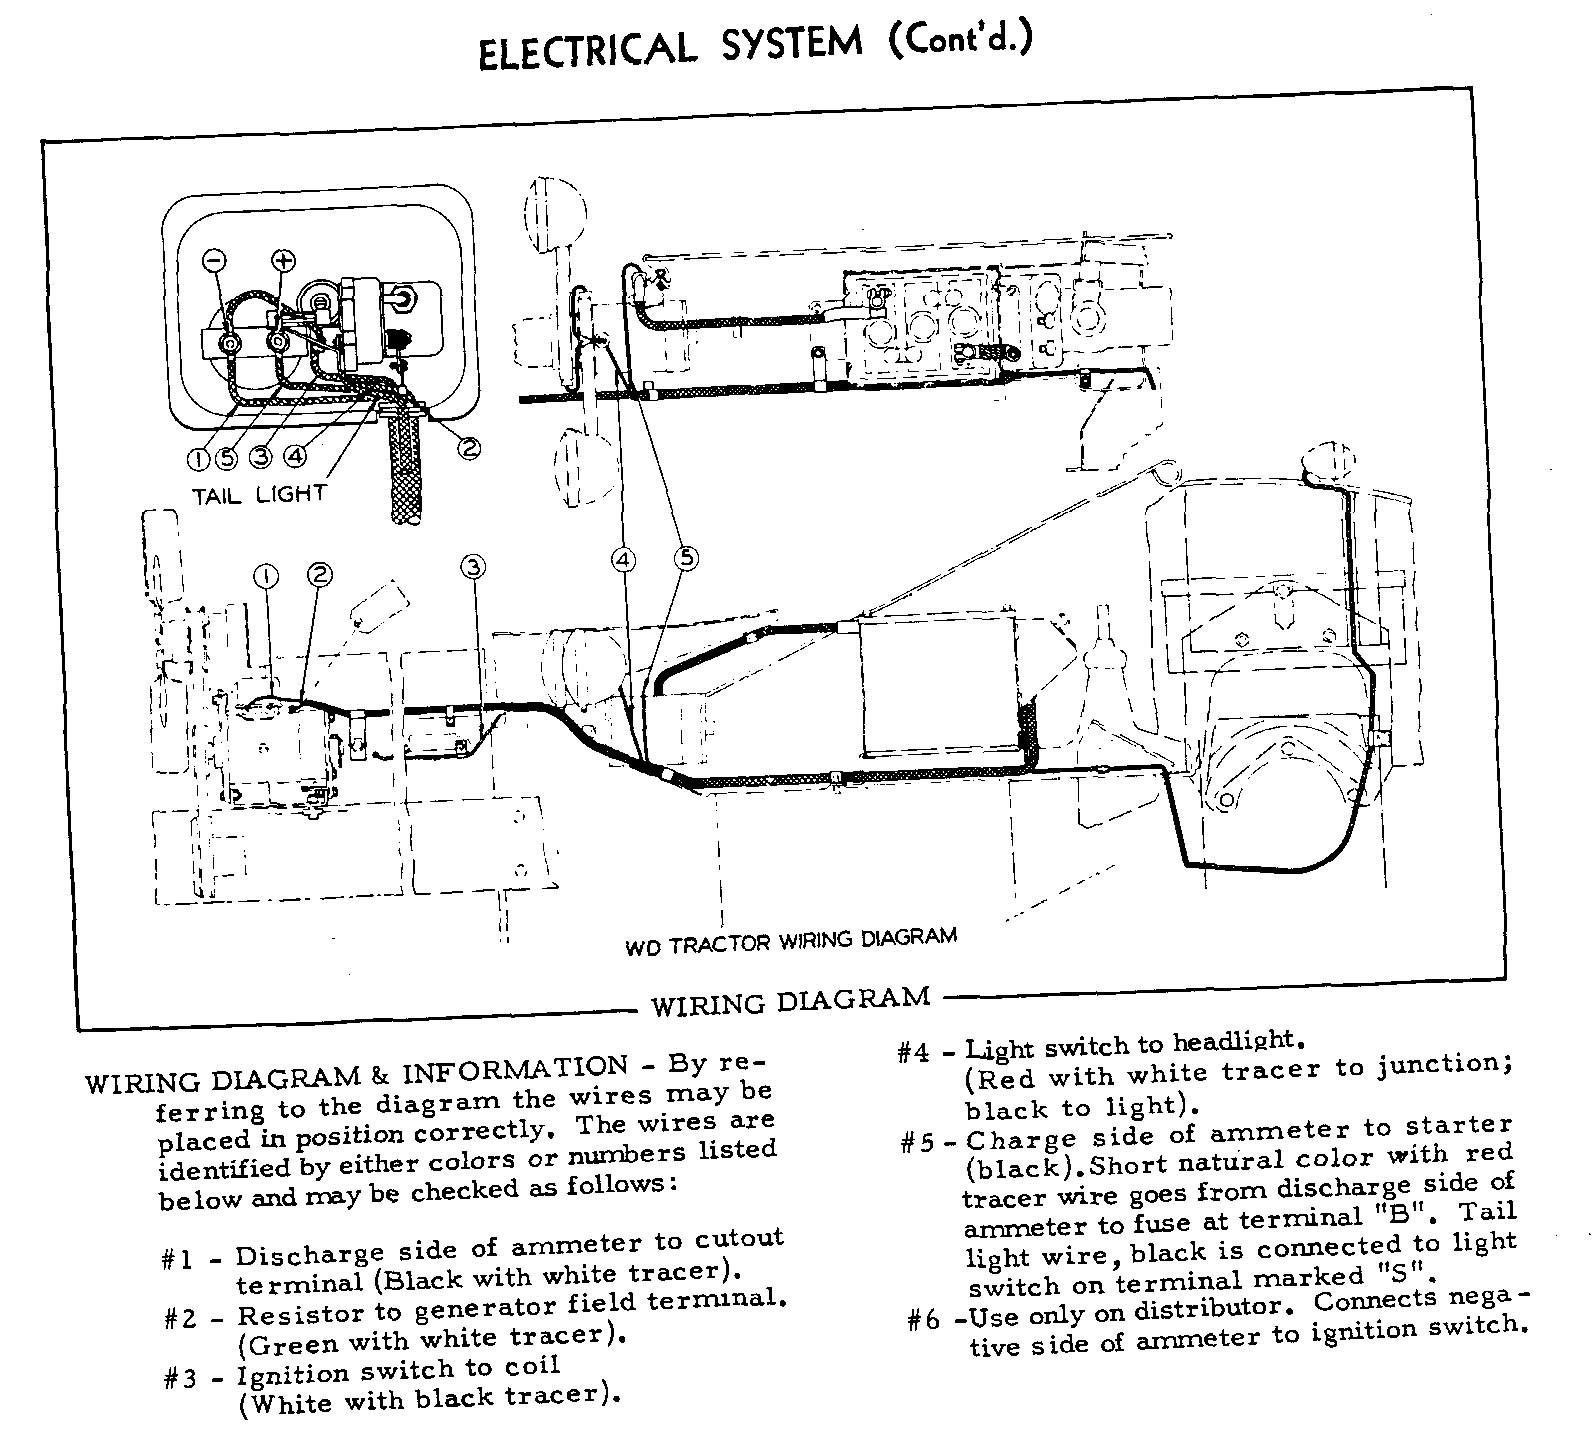 diesel engine starter diagram honda civic 2000 wiring 79 f150 solenoid